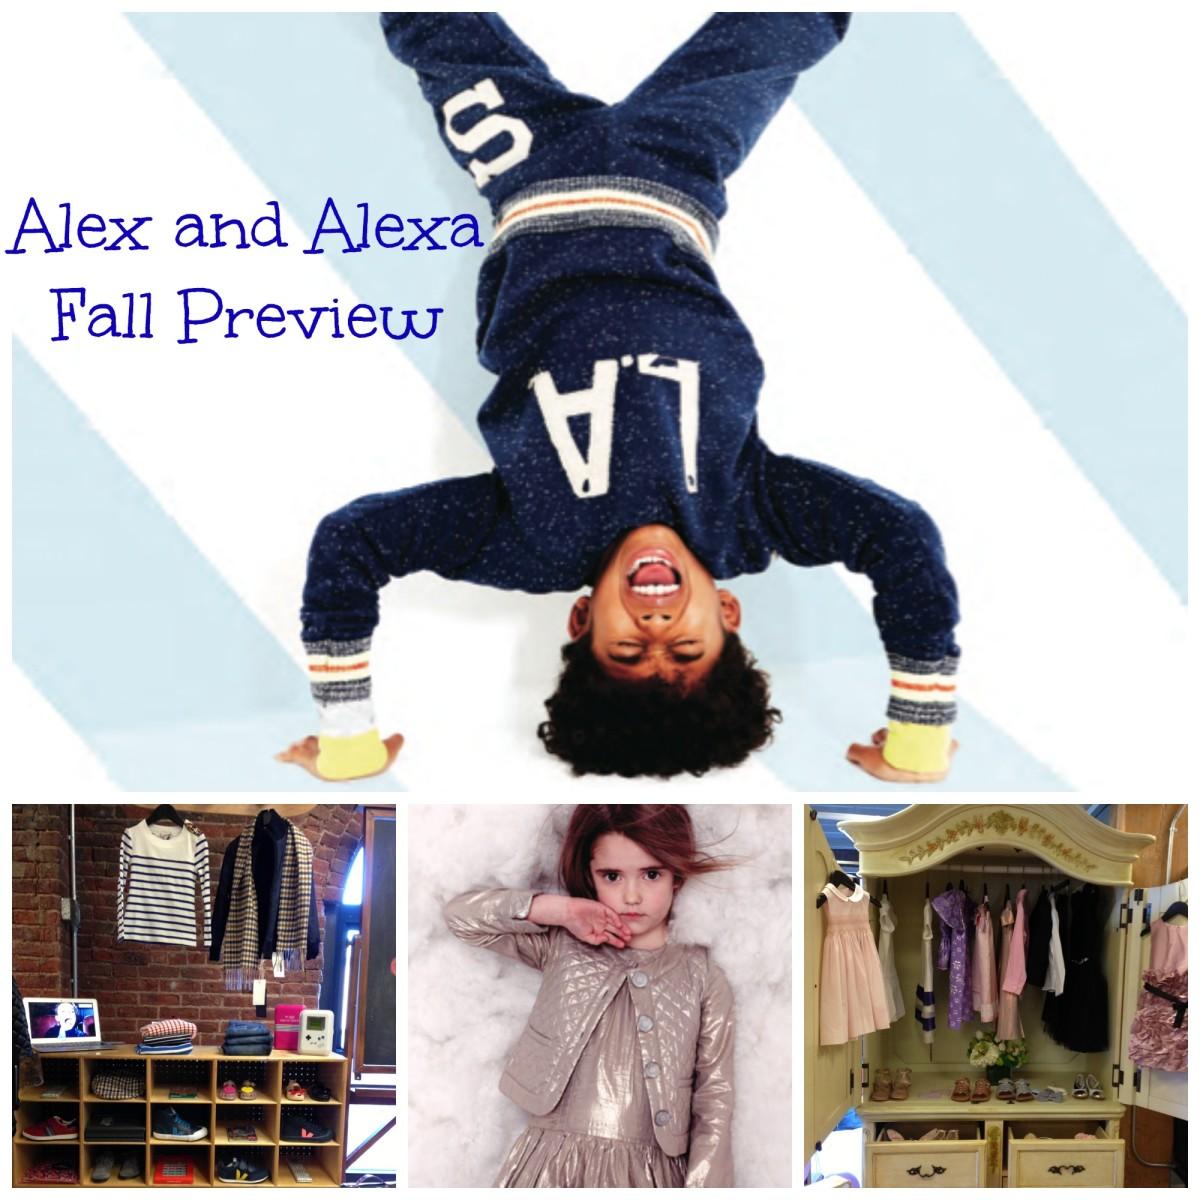 alex and alexa fall preview